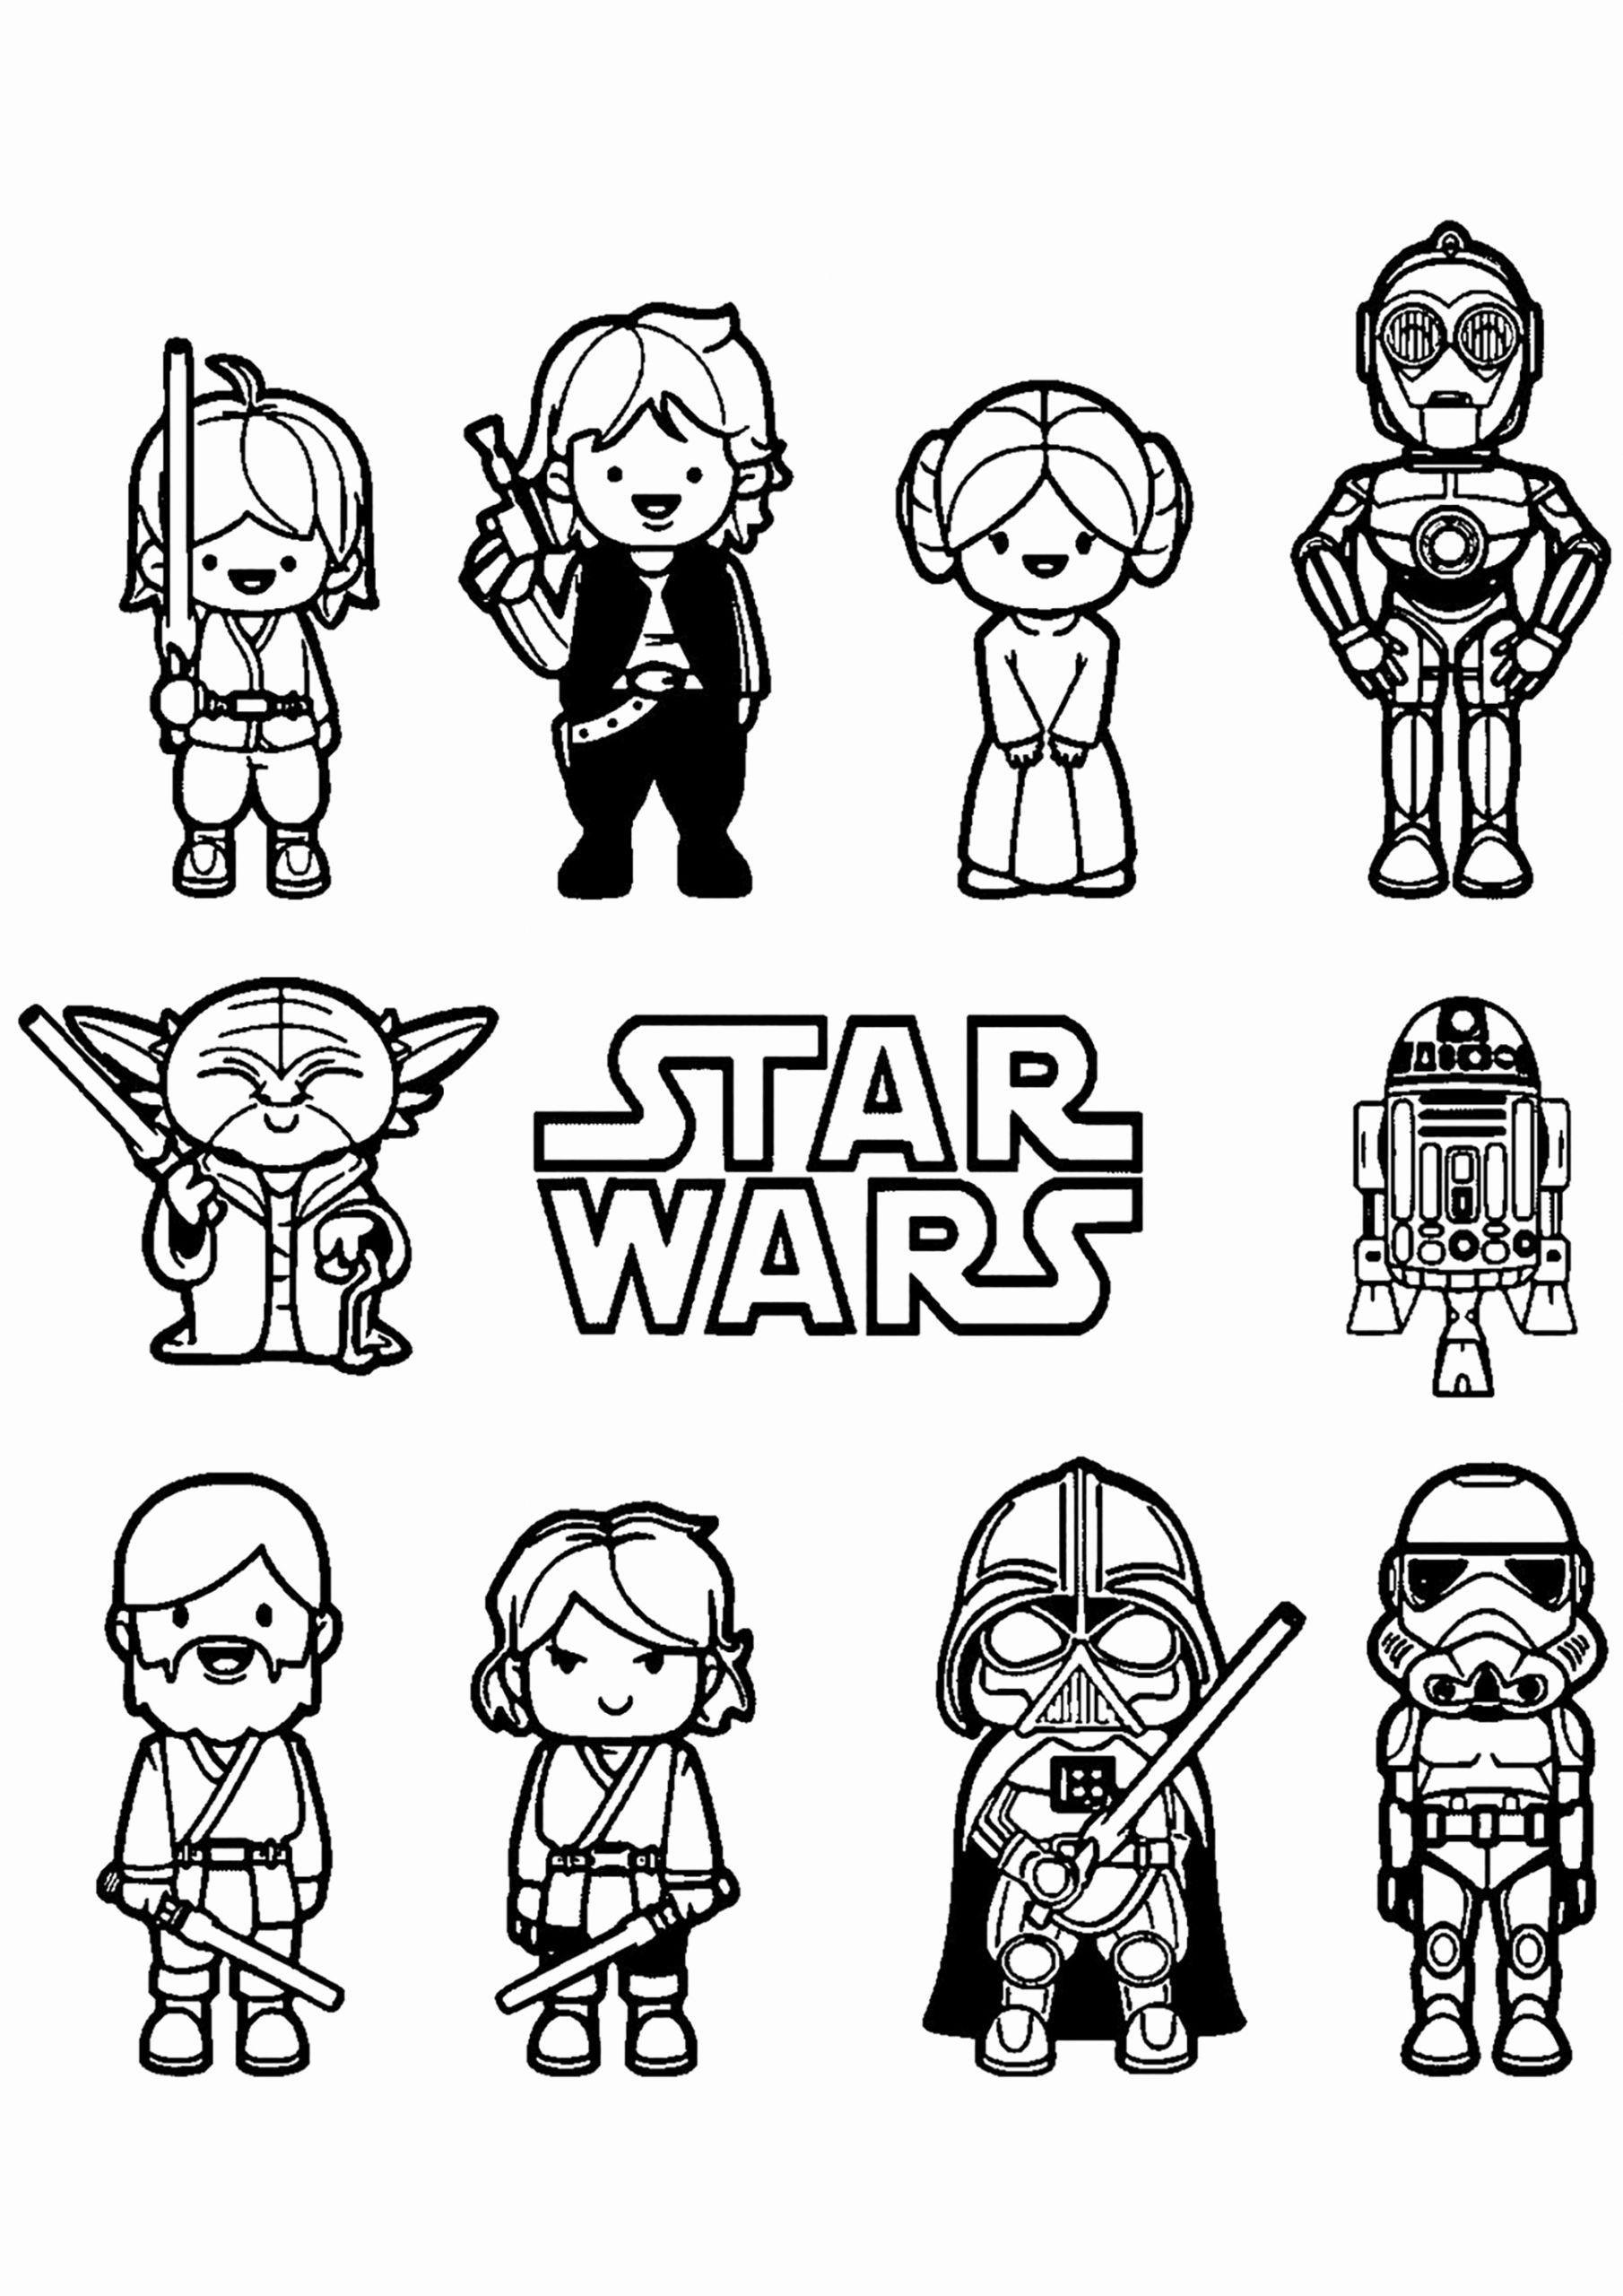 Star Wars Prints Star Wars Gifts 2020 Star Wars Coloring Book Star Wars Coloring Sheet Star Wars Cartoon